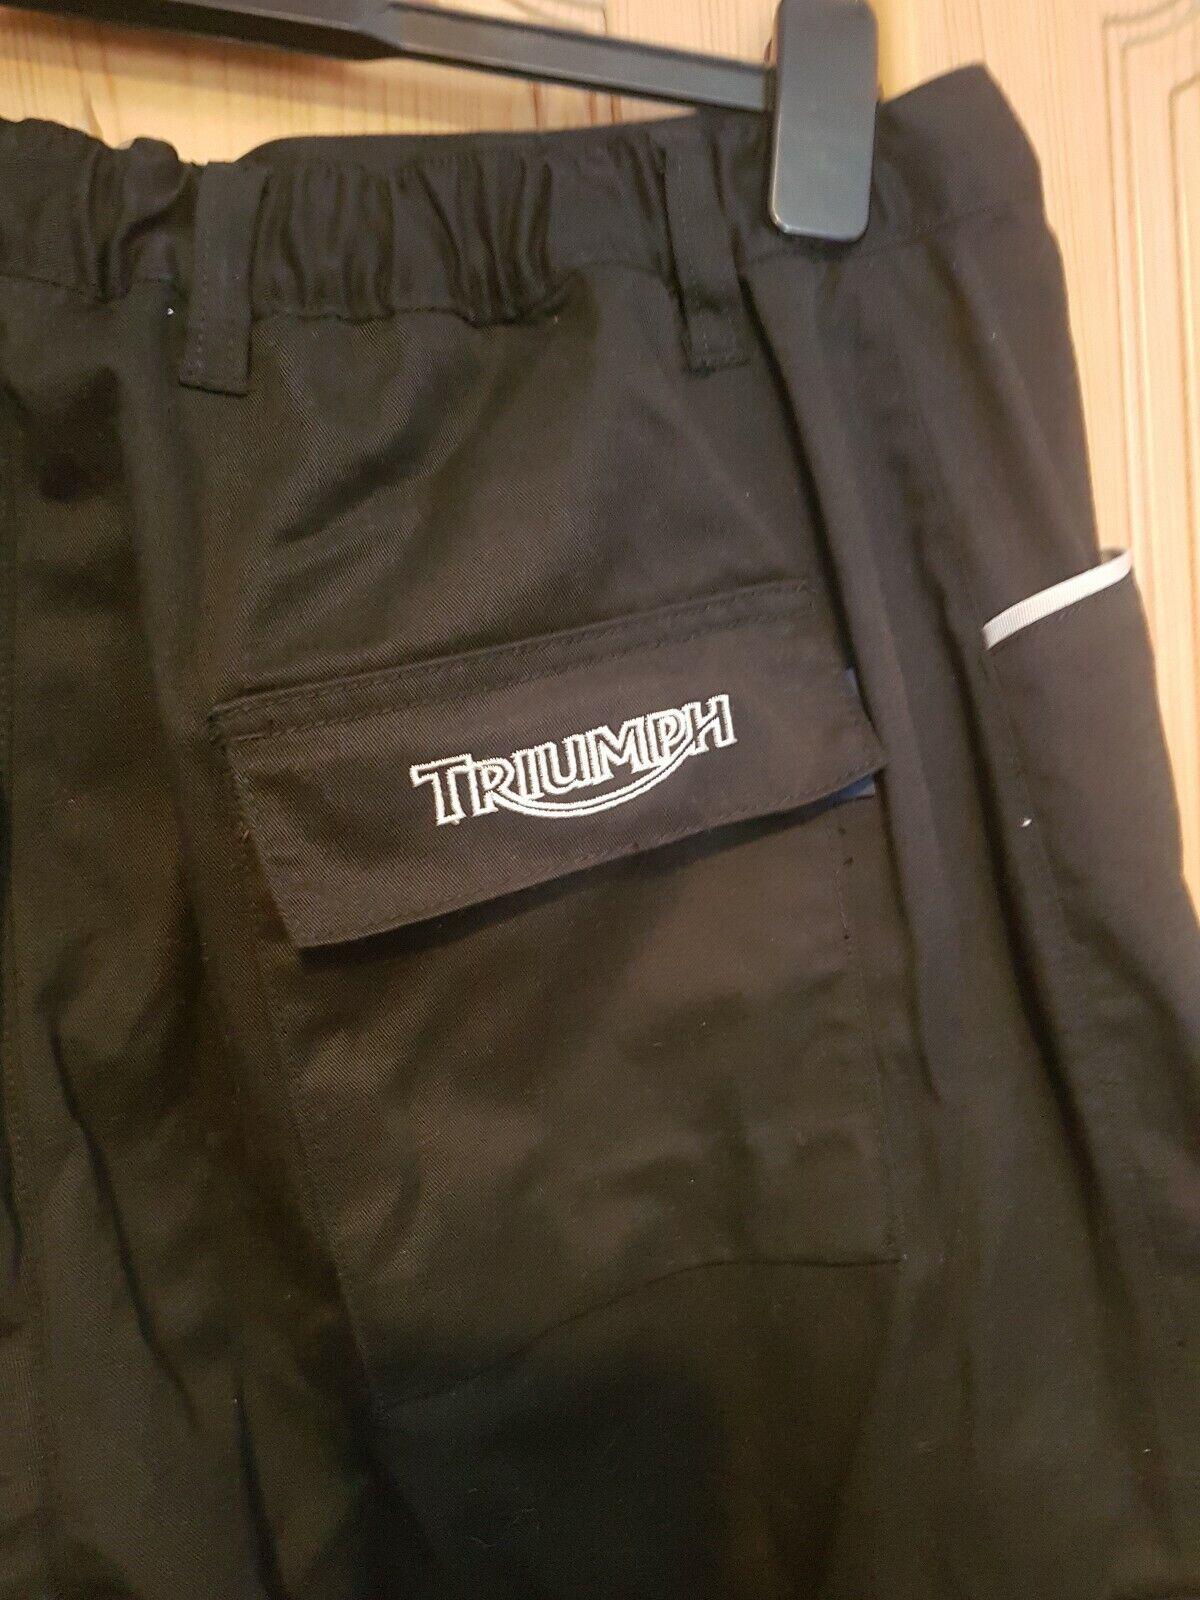 Triumph Work Trousers Size 2XL